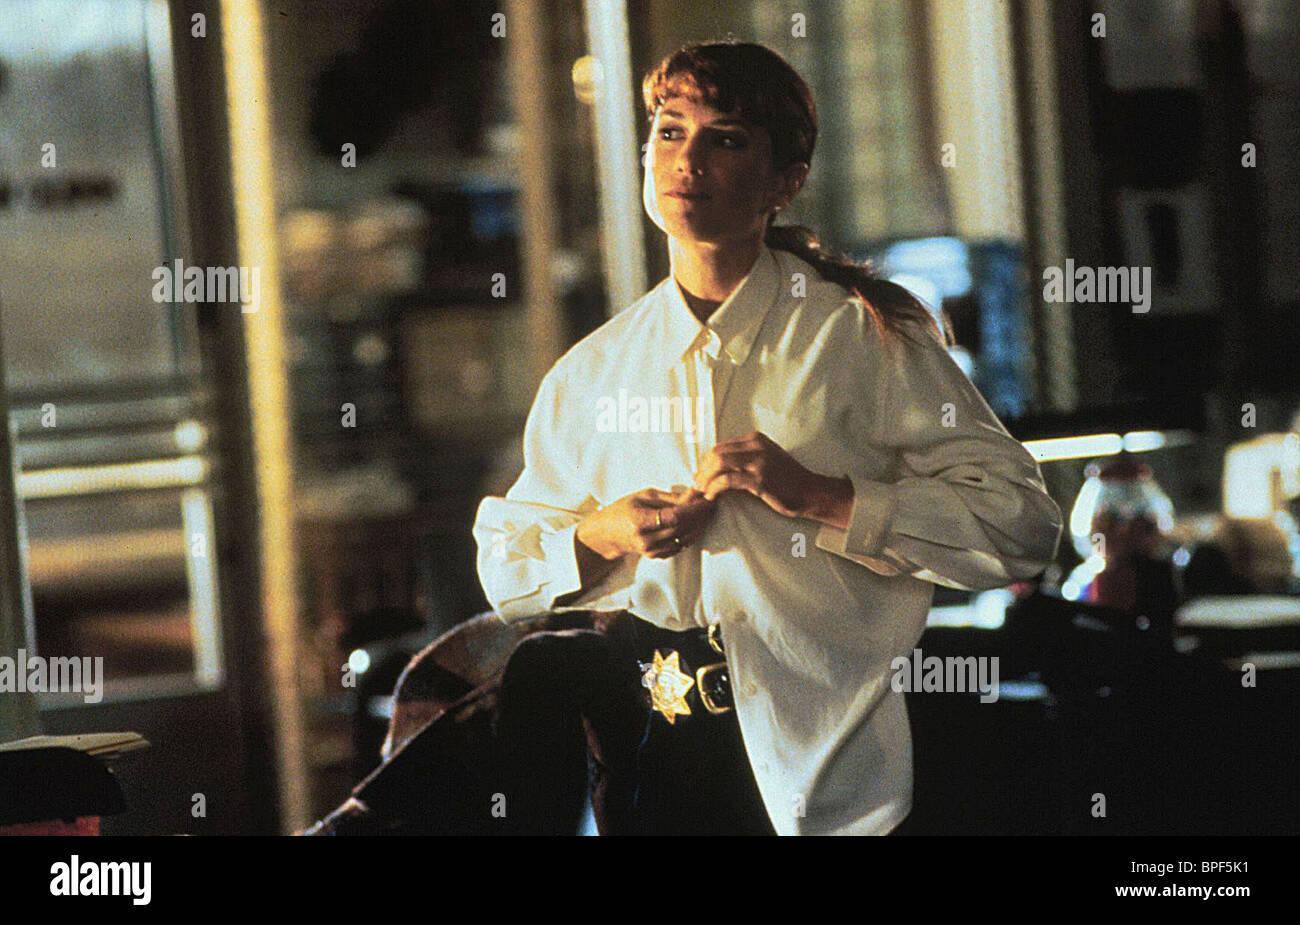 HOLLY HUNTER COPYCAT (1995) - Stock Image